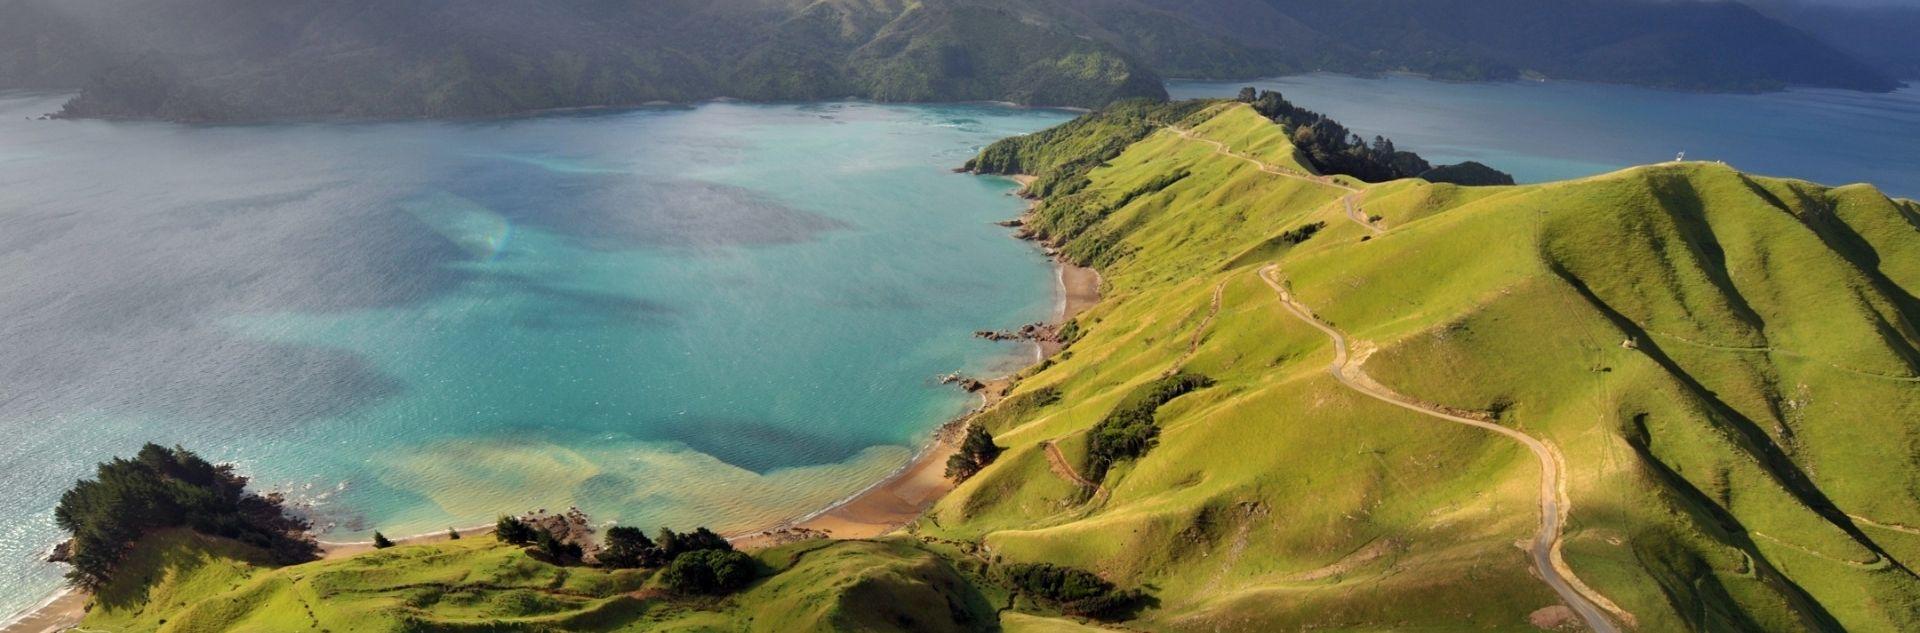 Fernreise Australien - Neuseeland Landschaft